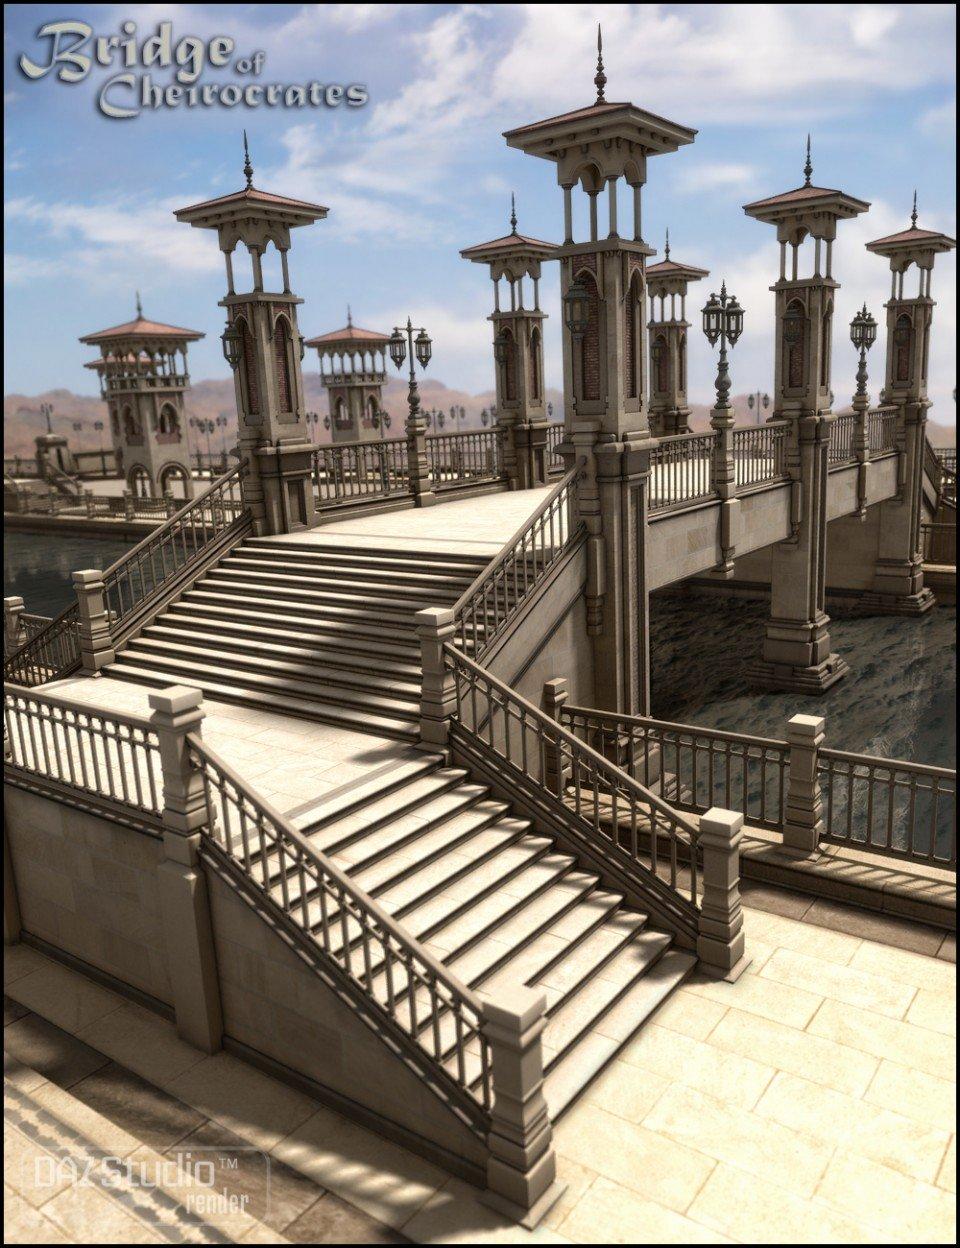 Bridge of Cheirocrates_DAZ3D下载站